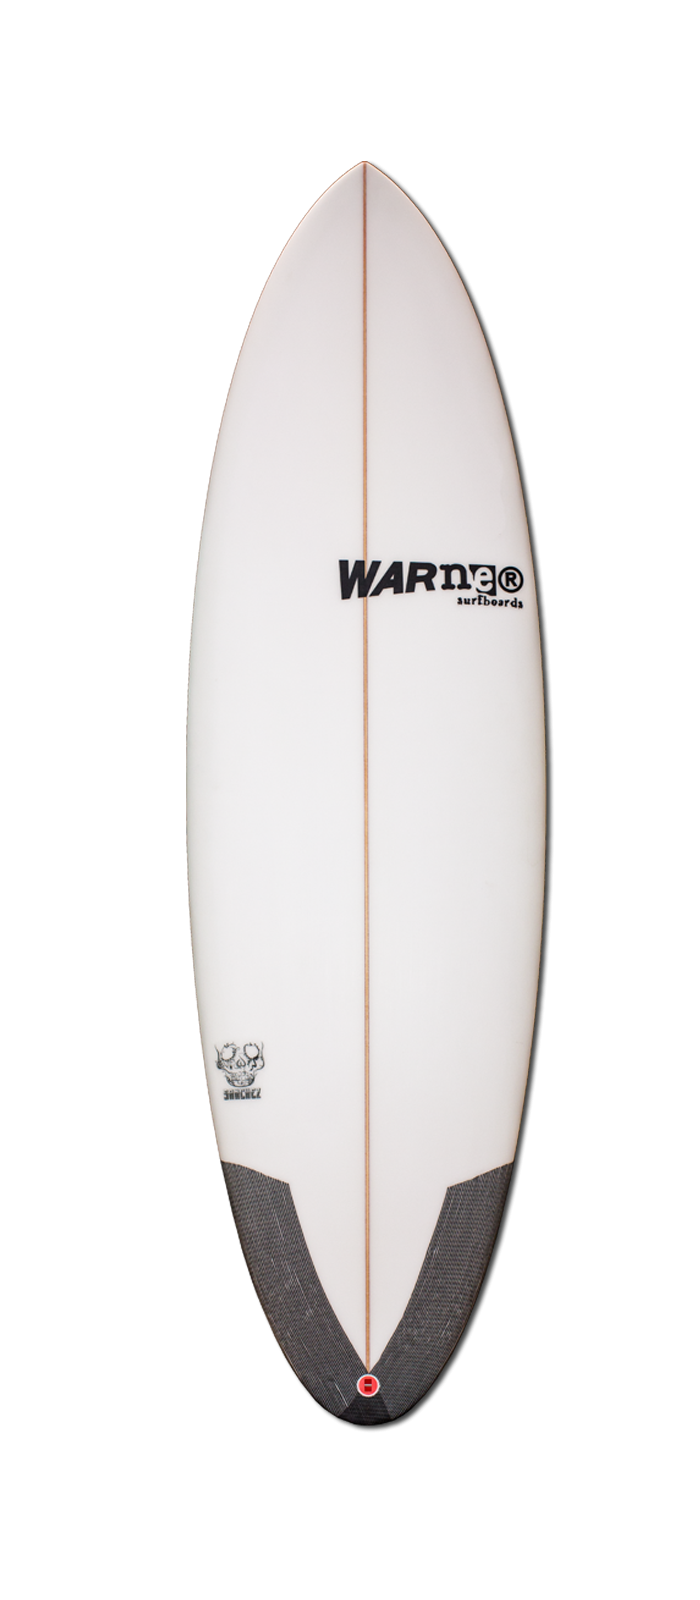 SANCHEZ surfboard model